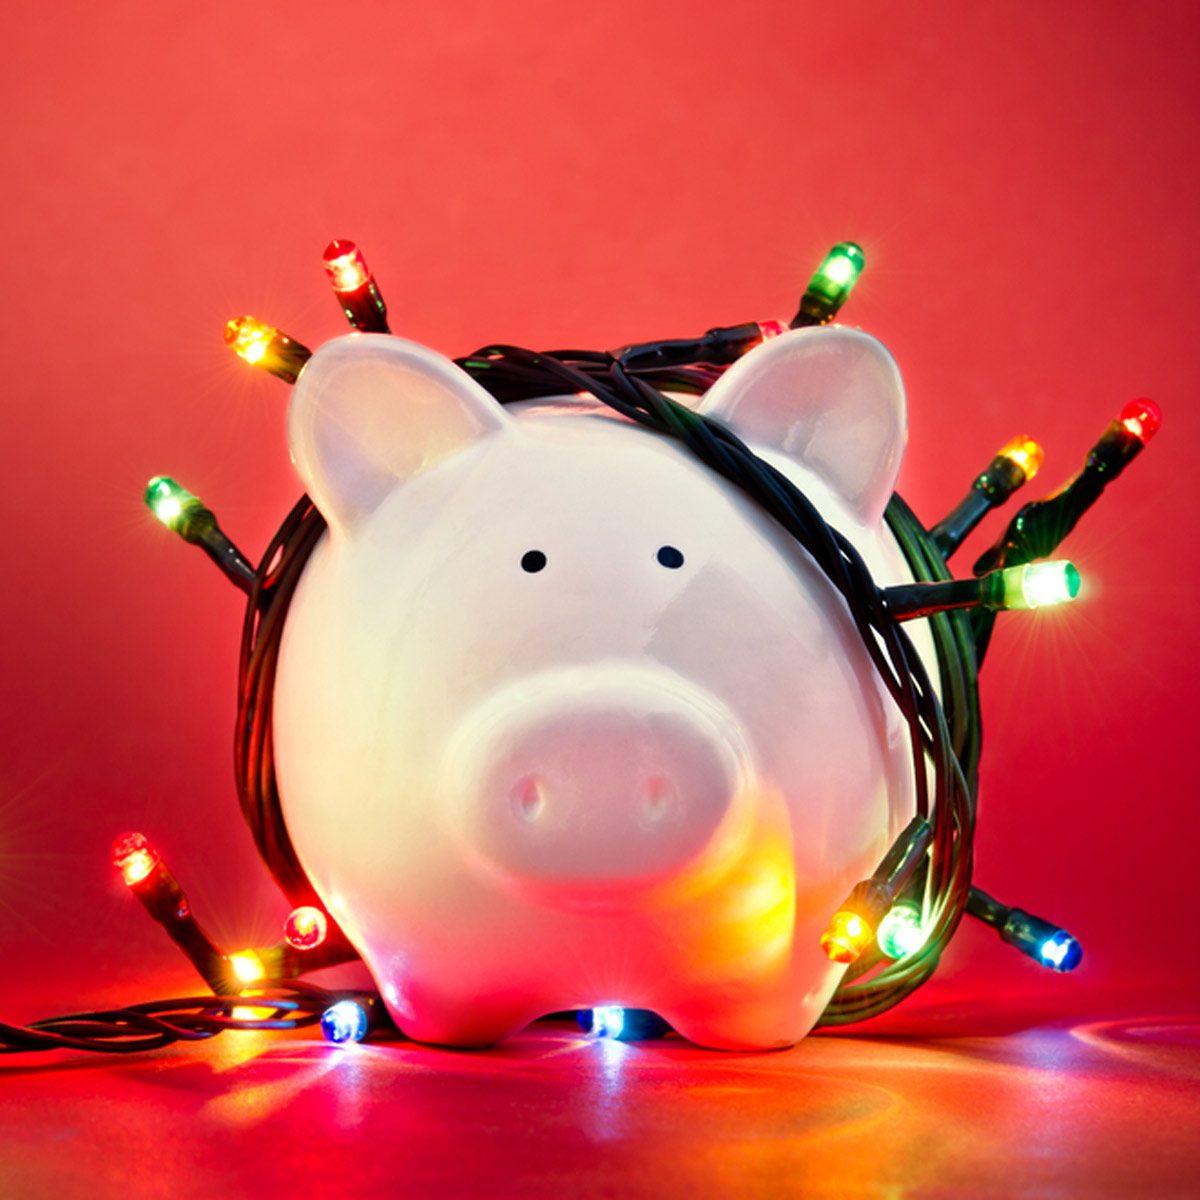 cost_158734355_01 led christmas lights saving money piggy bank money